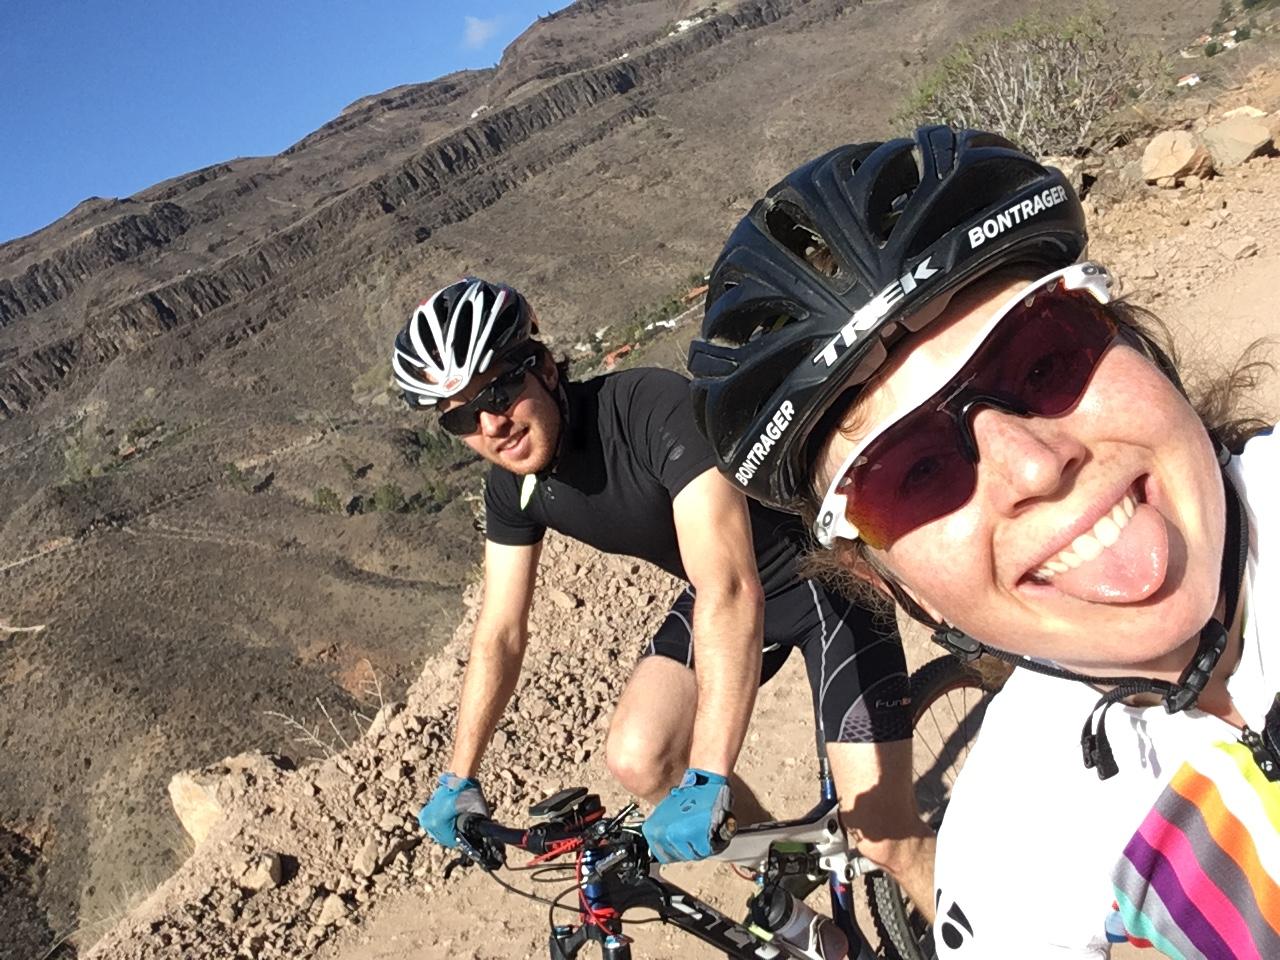 Årets første treningsleir – Gran Canaria